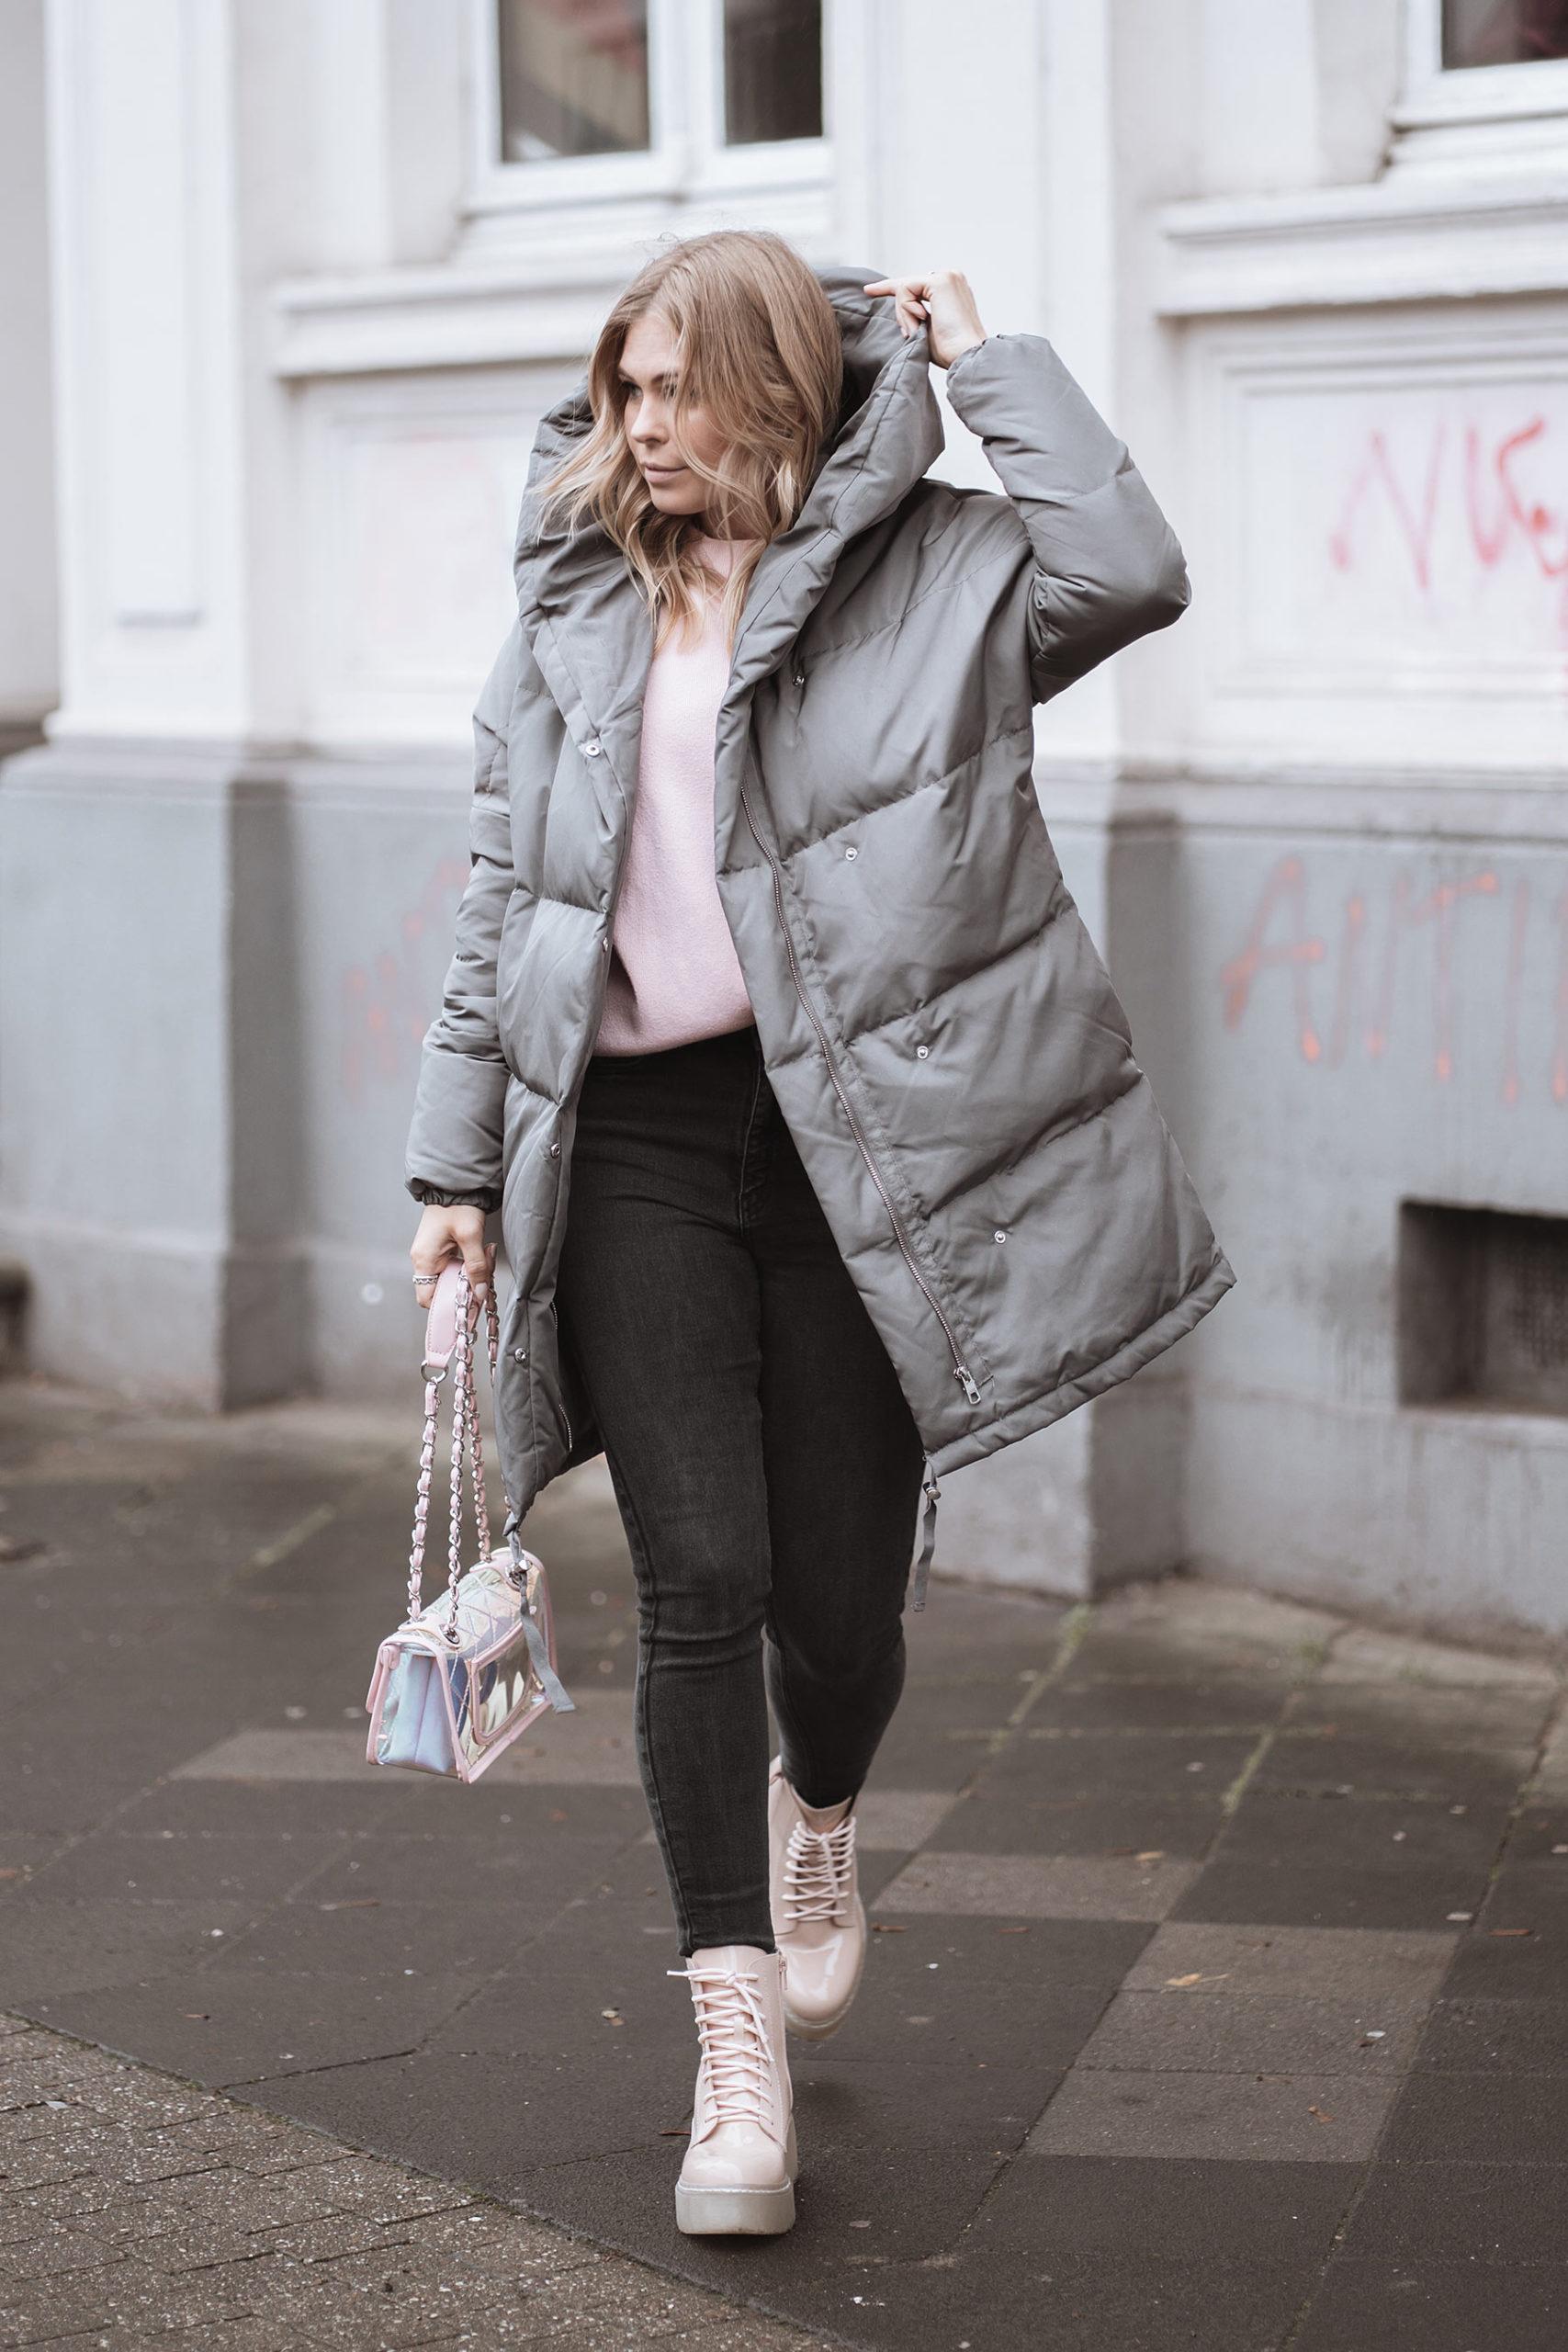 oversize daunenmantel streetstyle outfit fashion blogger düsseldorf